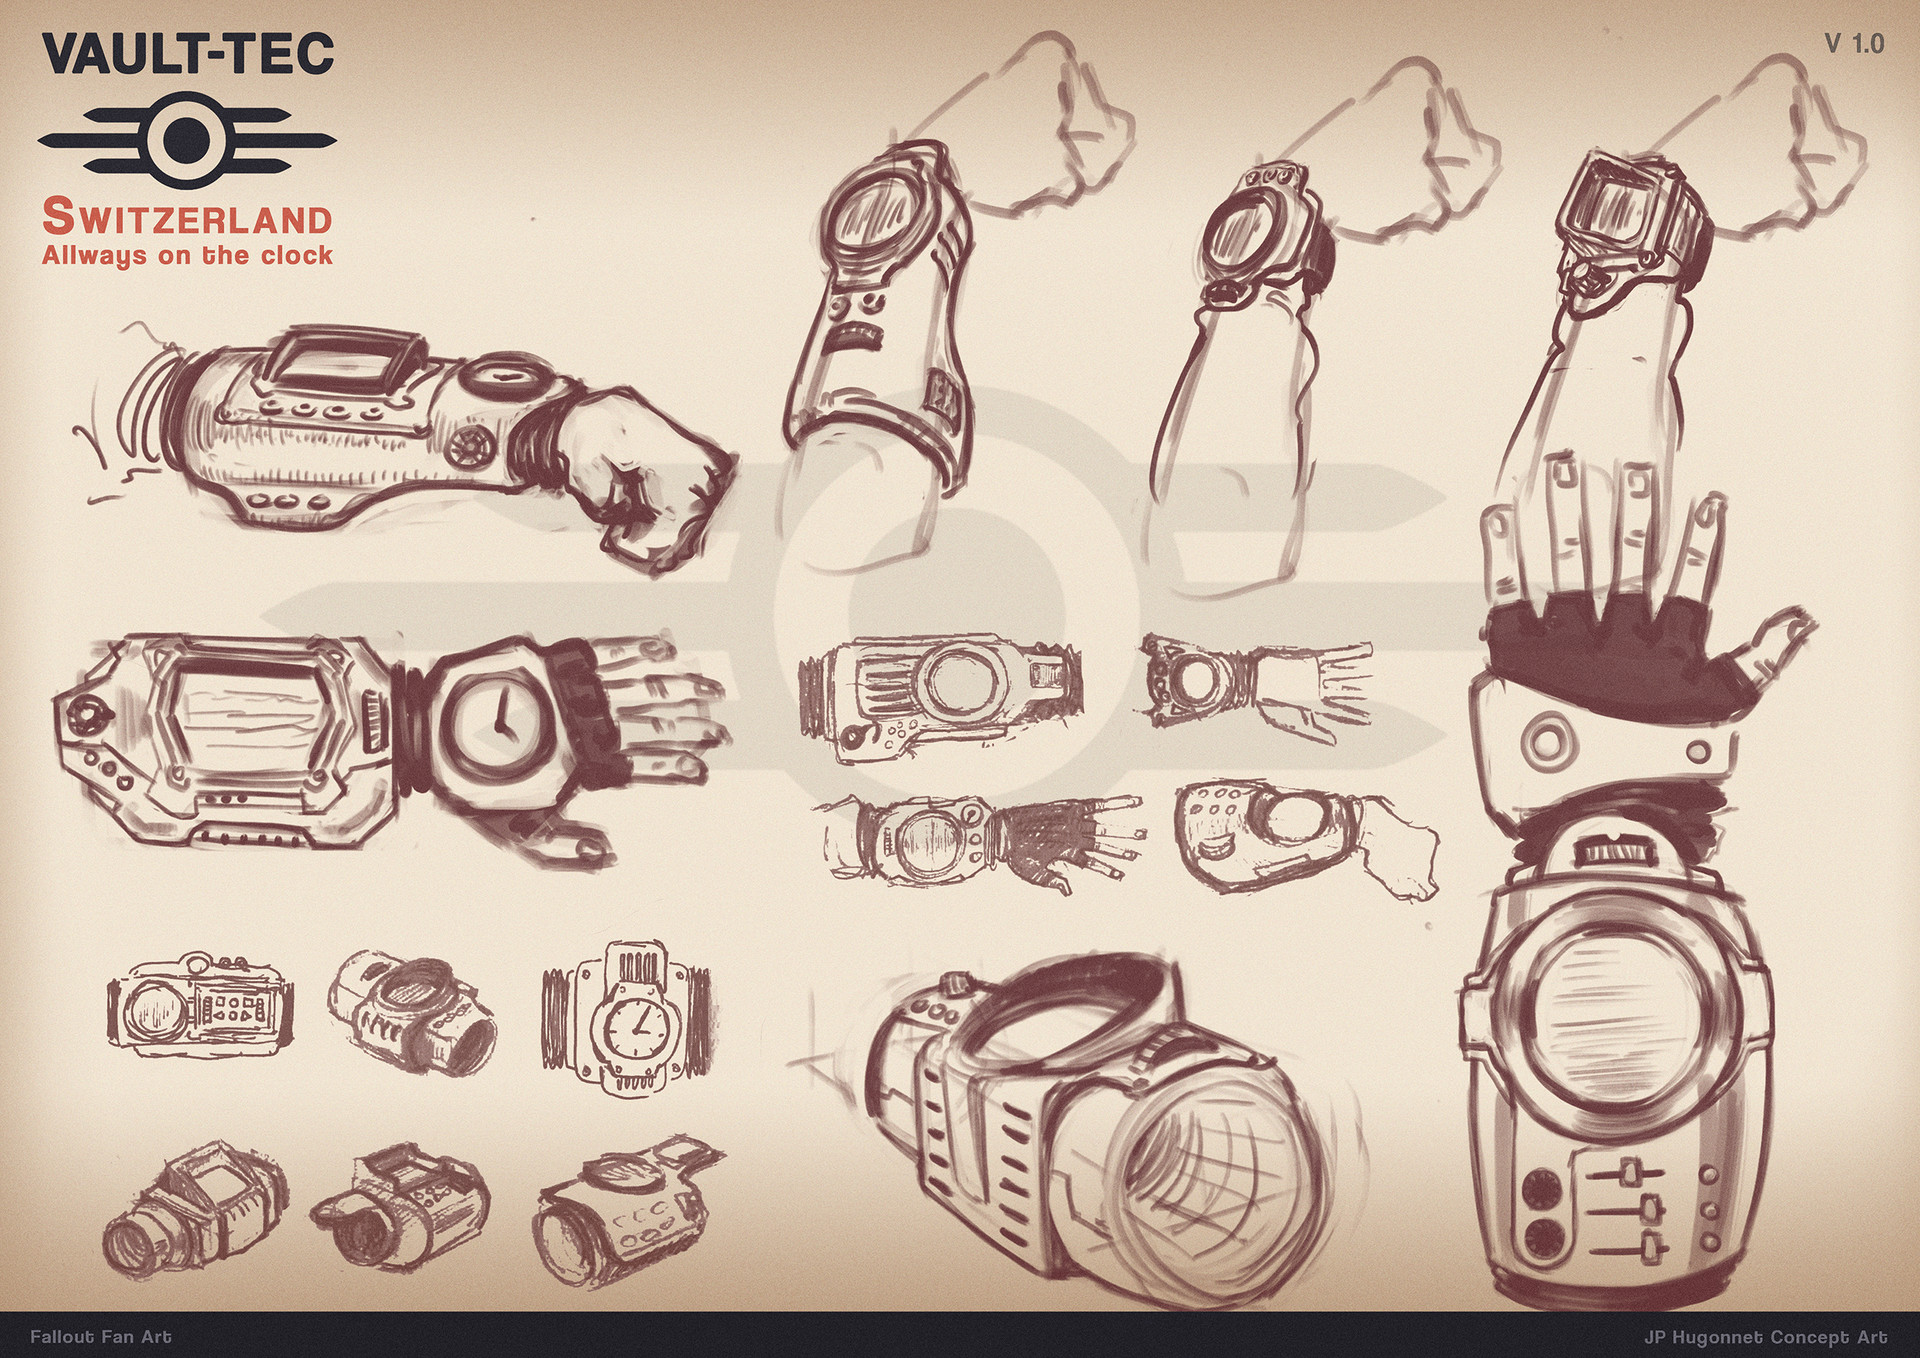 Jean philippe hugonnet sketches pimpboy2